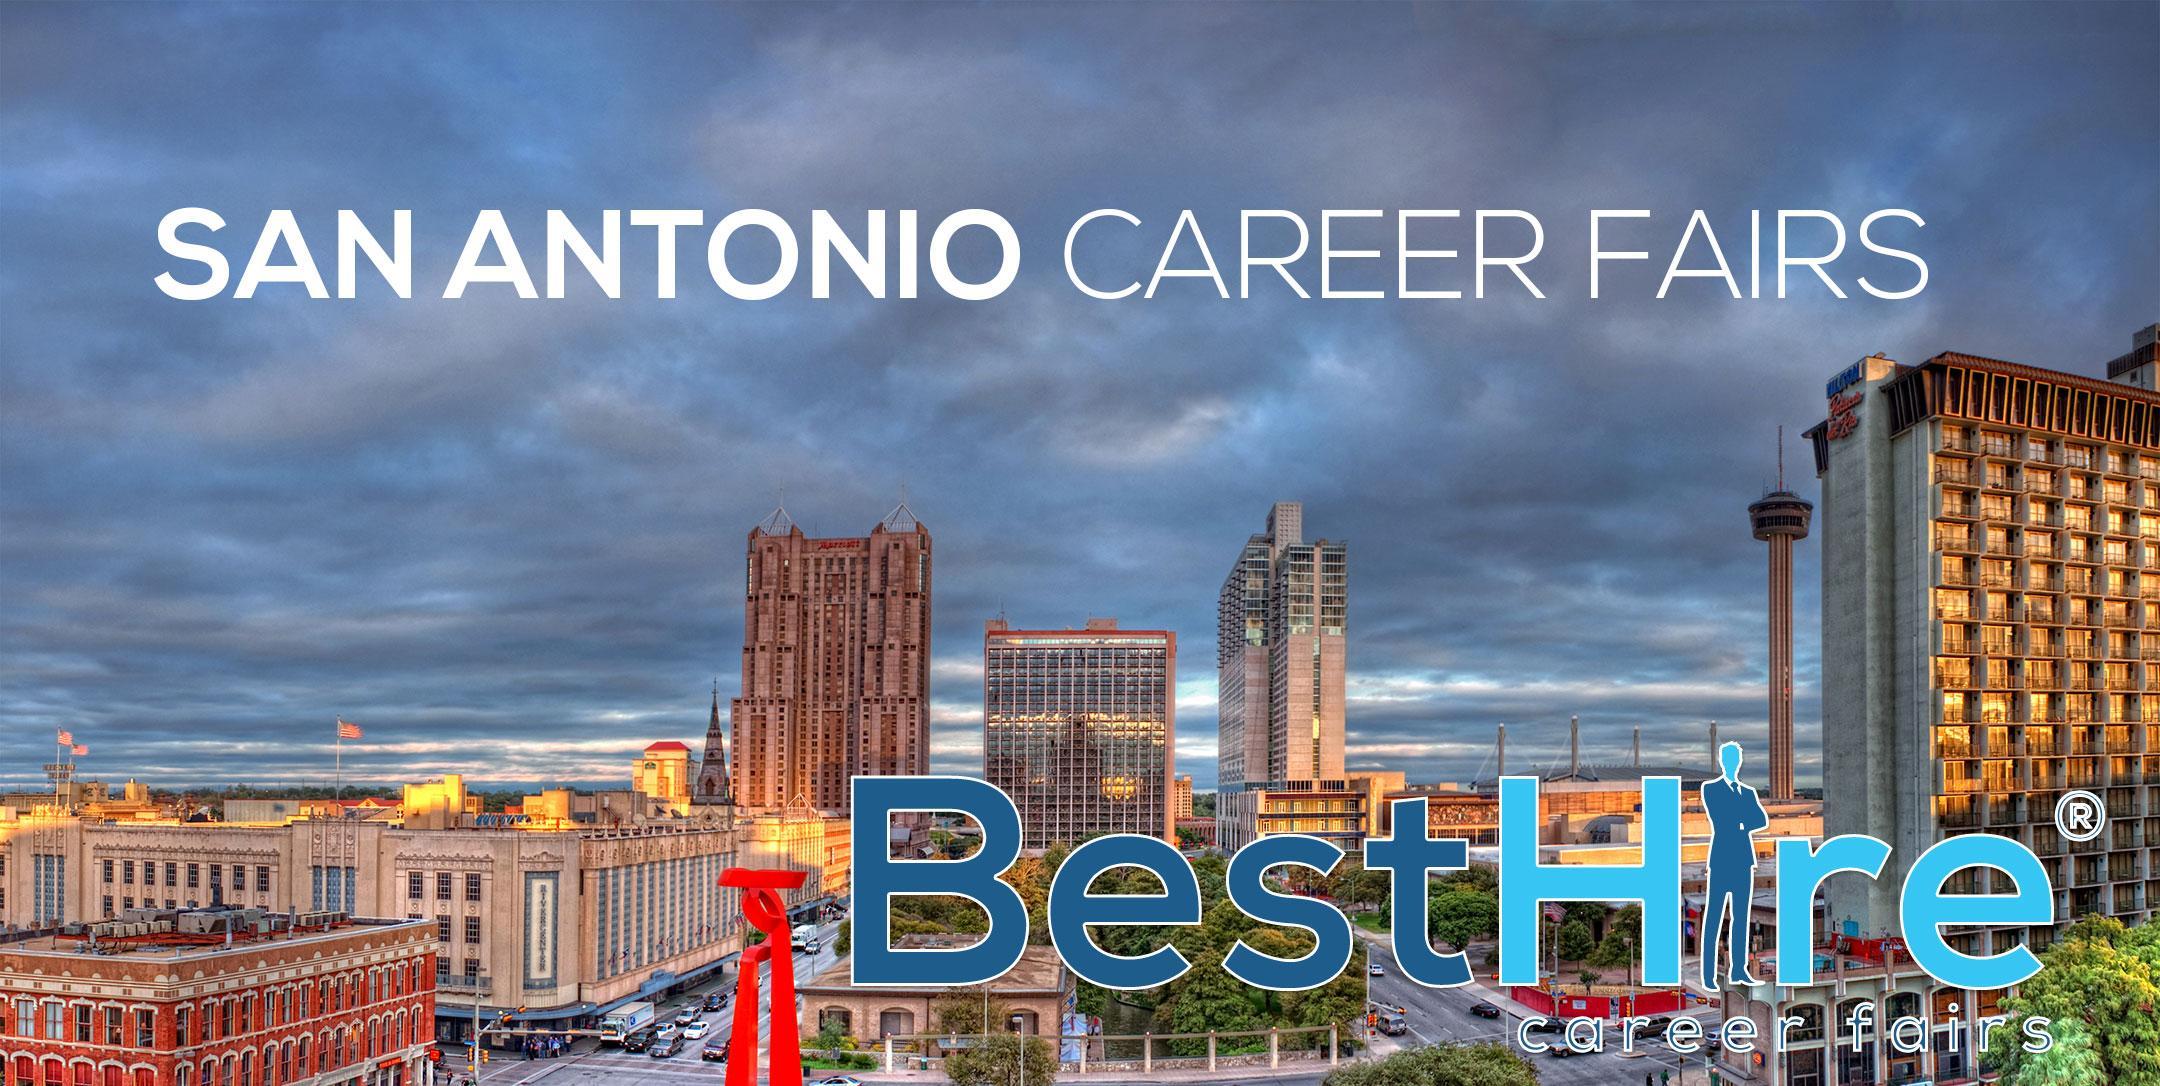 San Antonio Career Fair March 8, 2018 - Job Fairs & Hiring Events in San Antonio TX